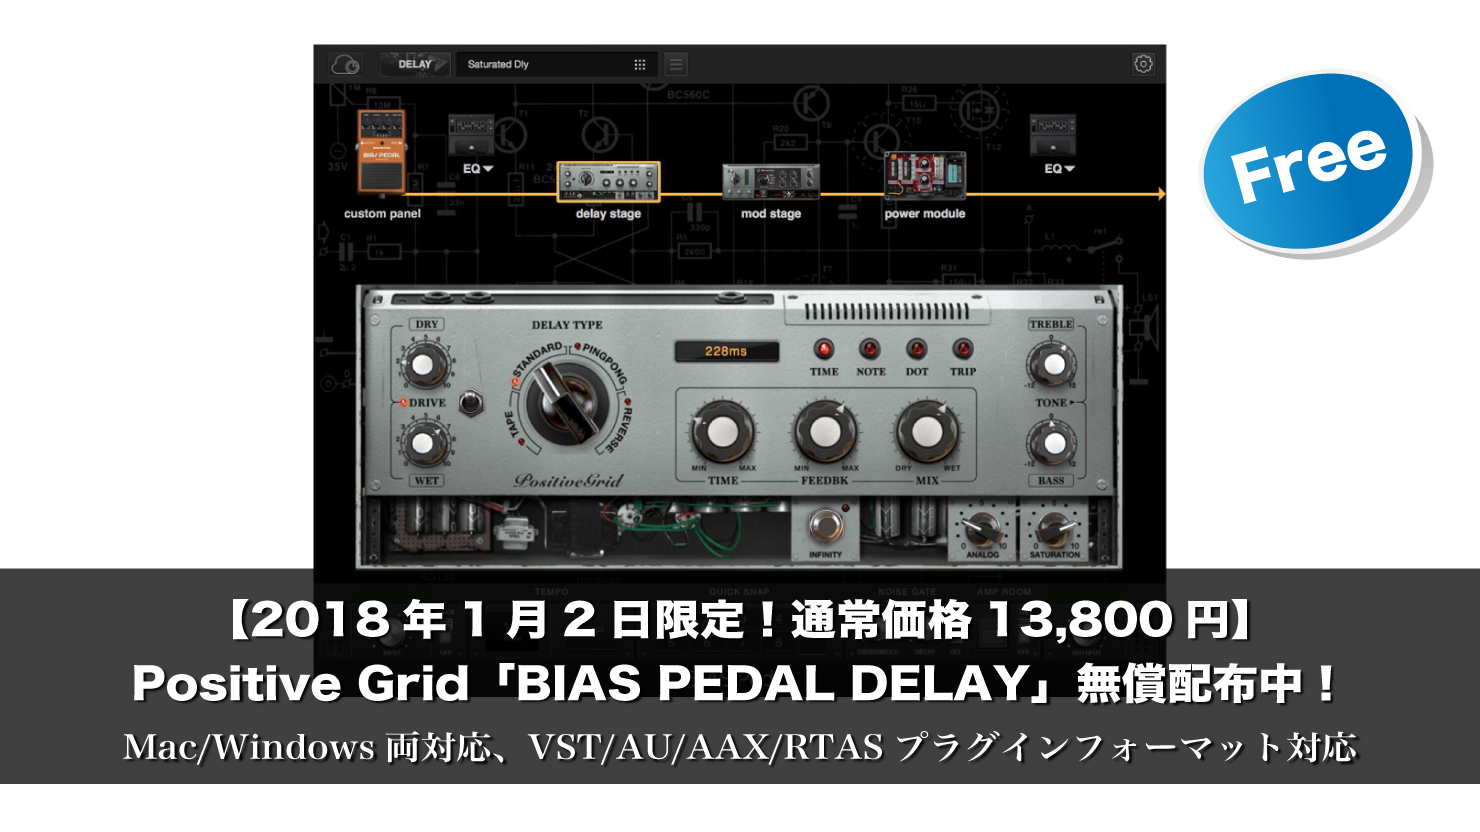 【期間限定・無料】通常価格13,800円!Positive Grid「BIAS PEDAL DELAY」無償配布中!